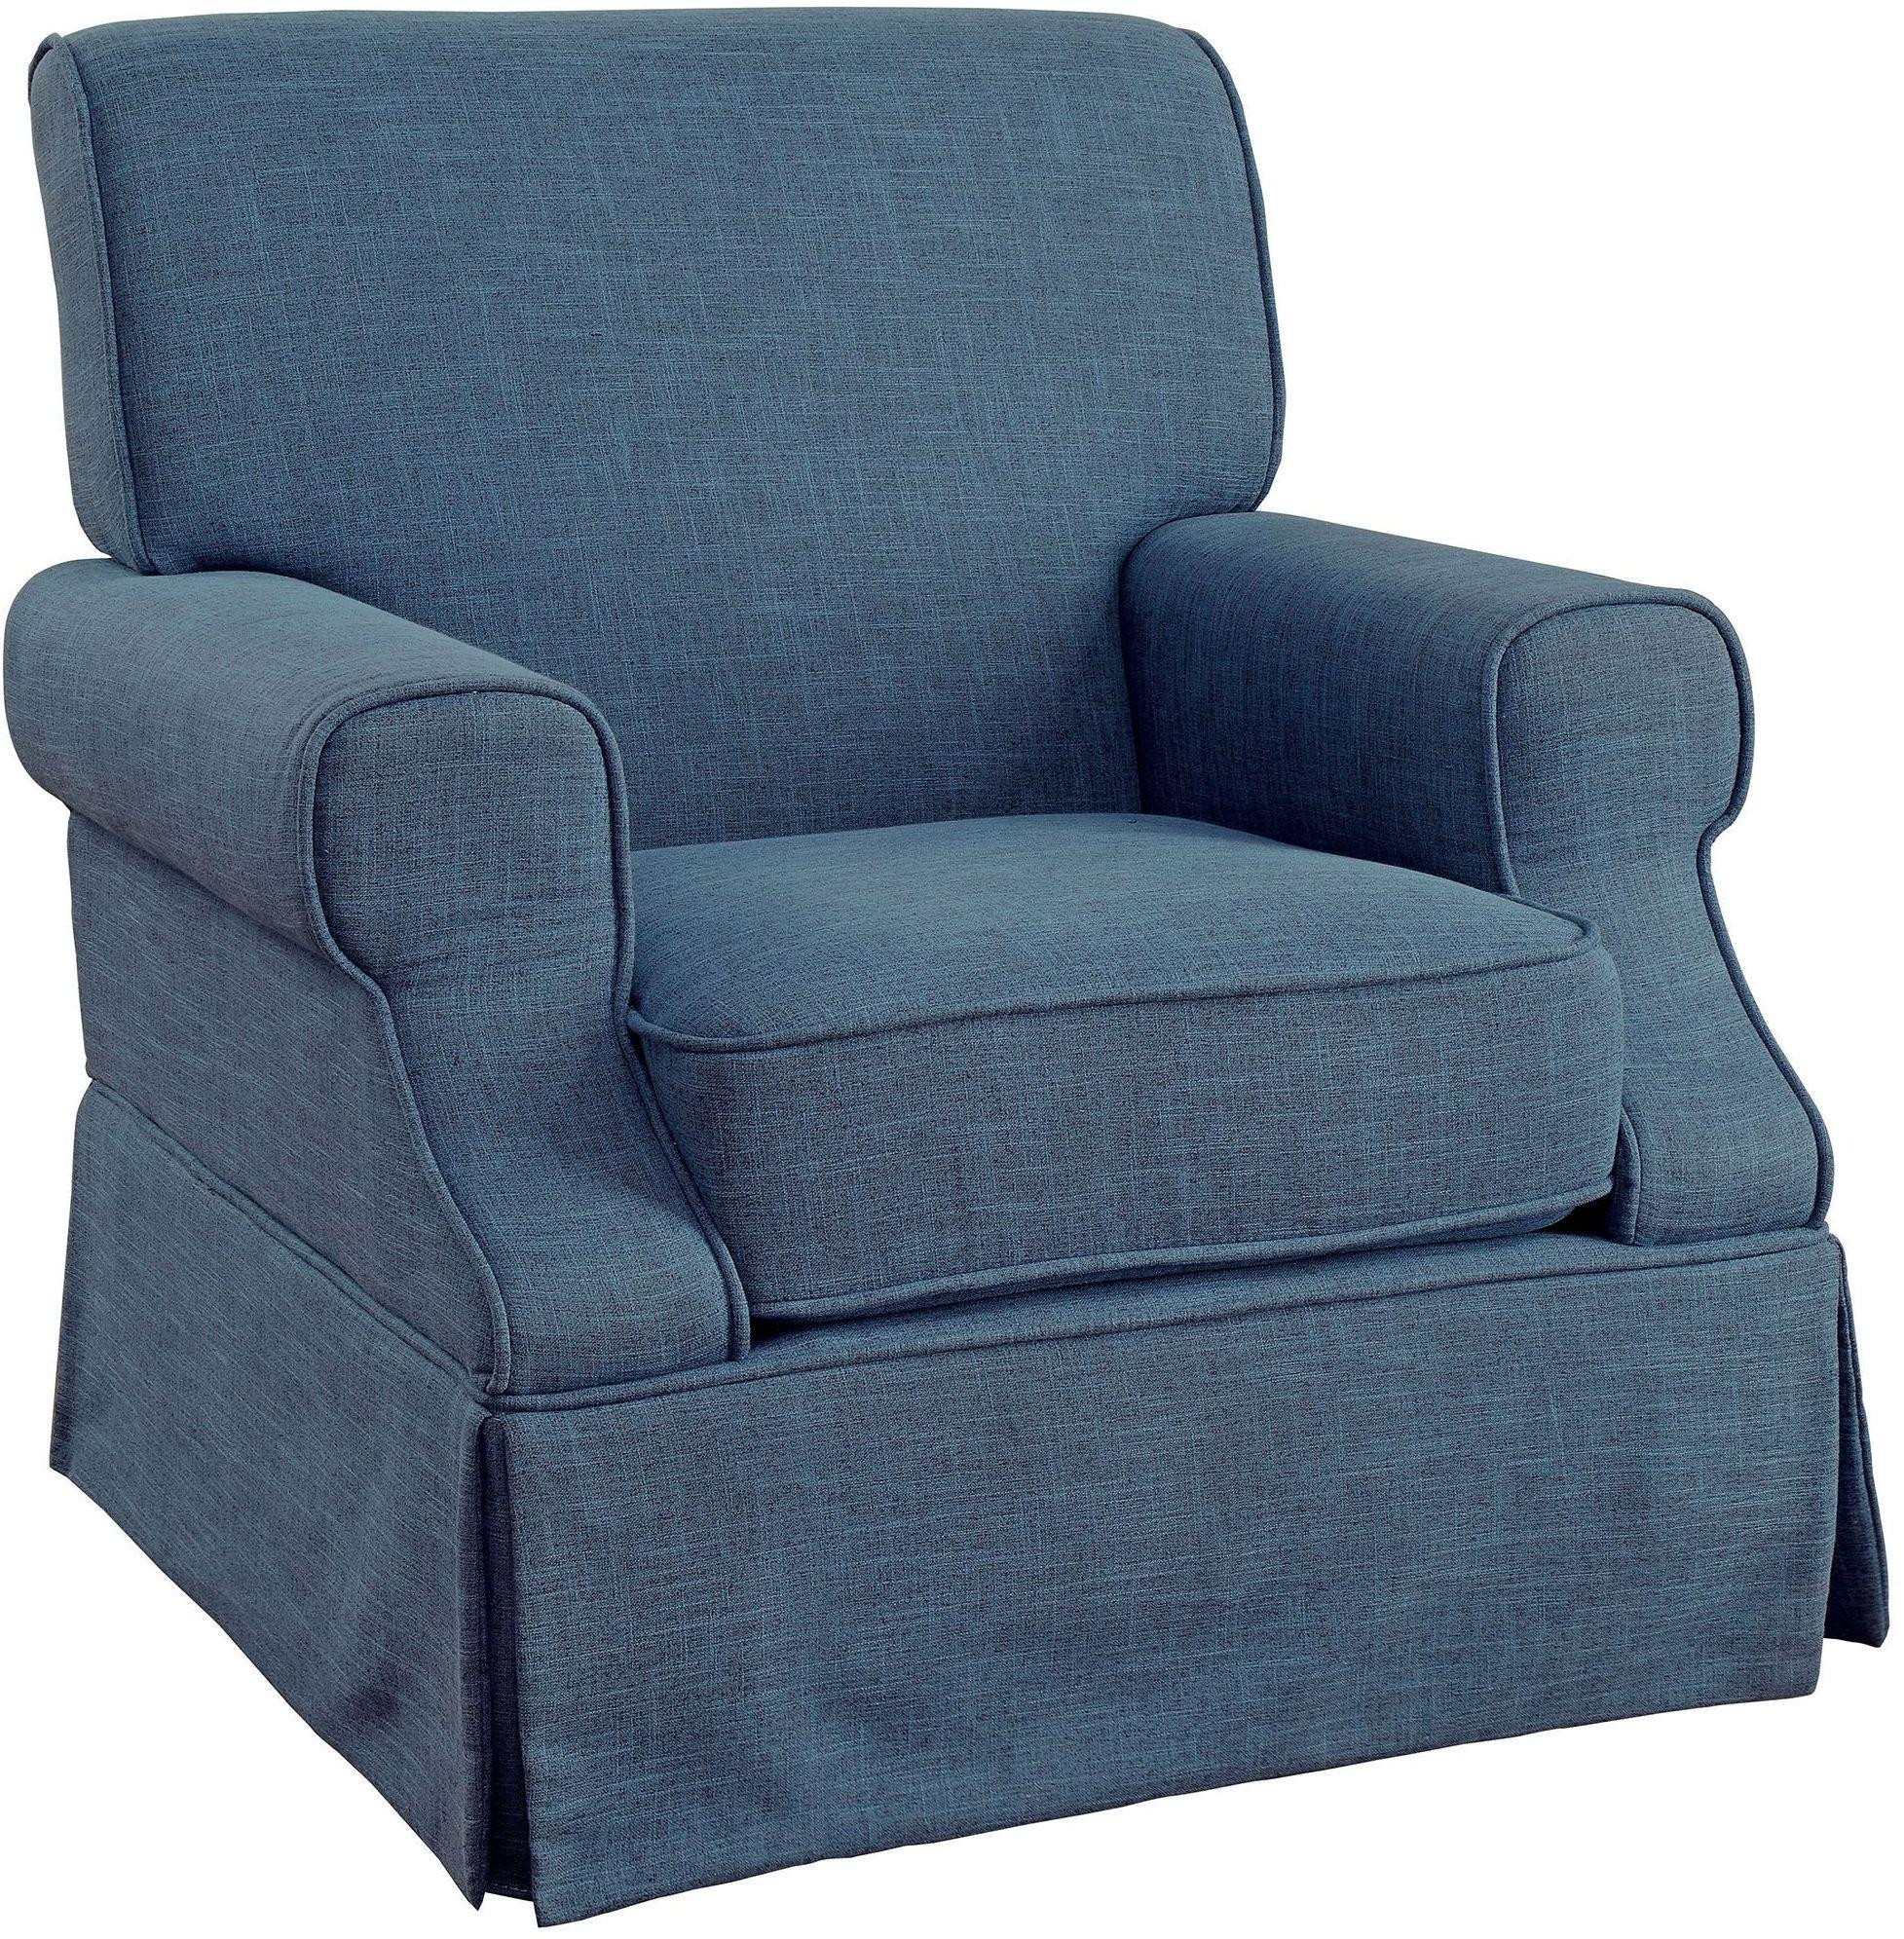 Leela Blue 360 Swivel Glider Amp Rocker Chair From Furniture